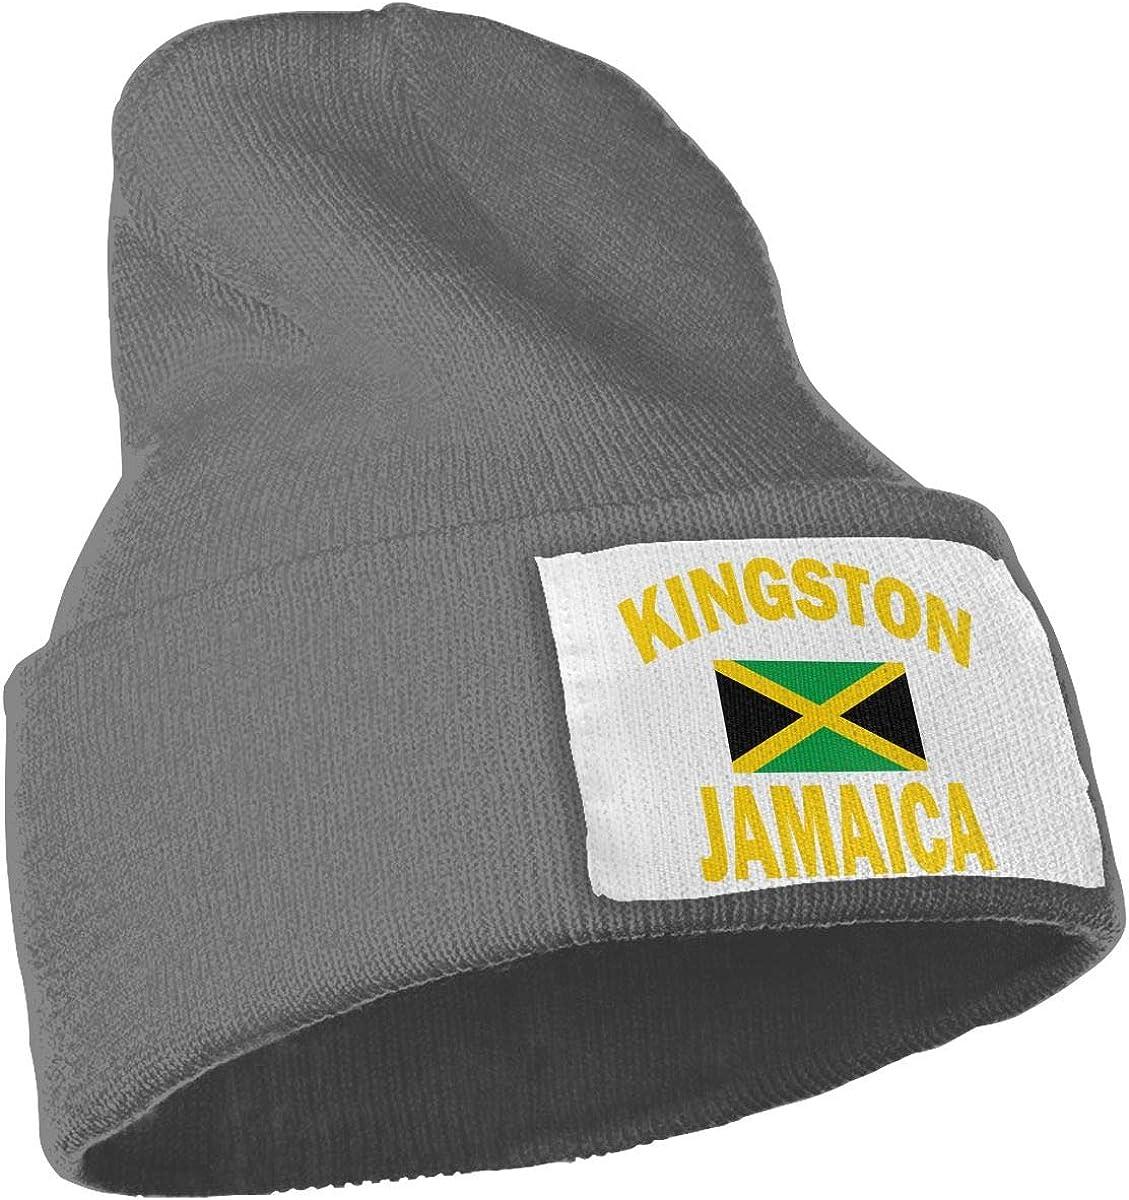 Kingston Jamaica Flag Men /& Women Skull Caps Winter Warm Stretchy Knit Beanie Hats